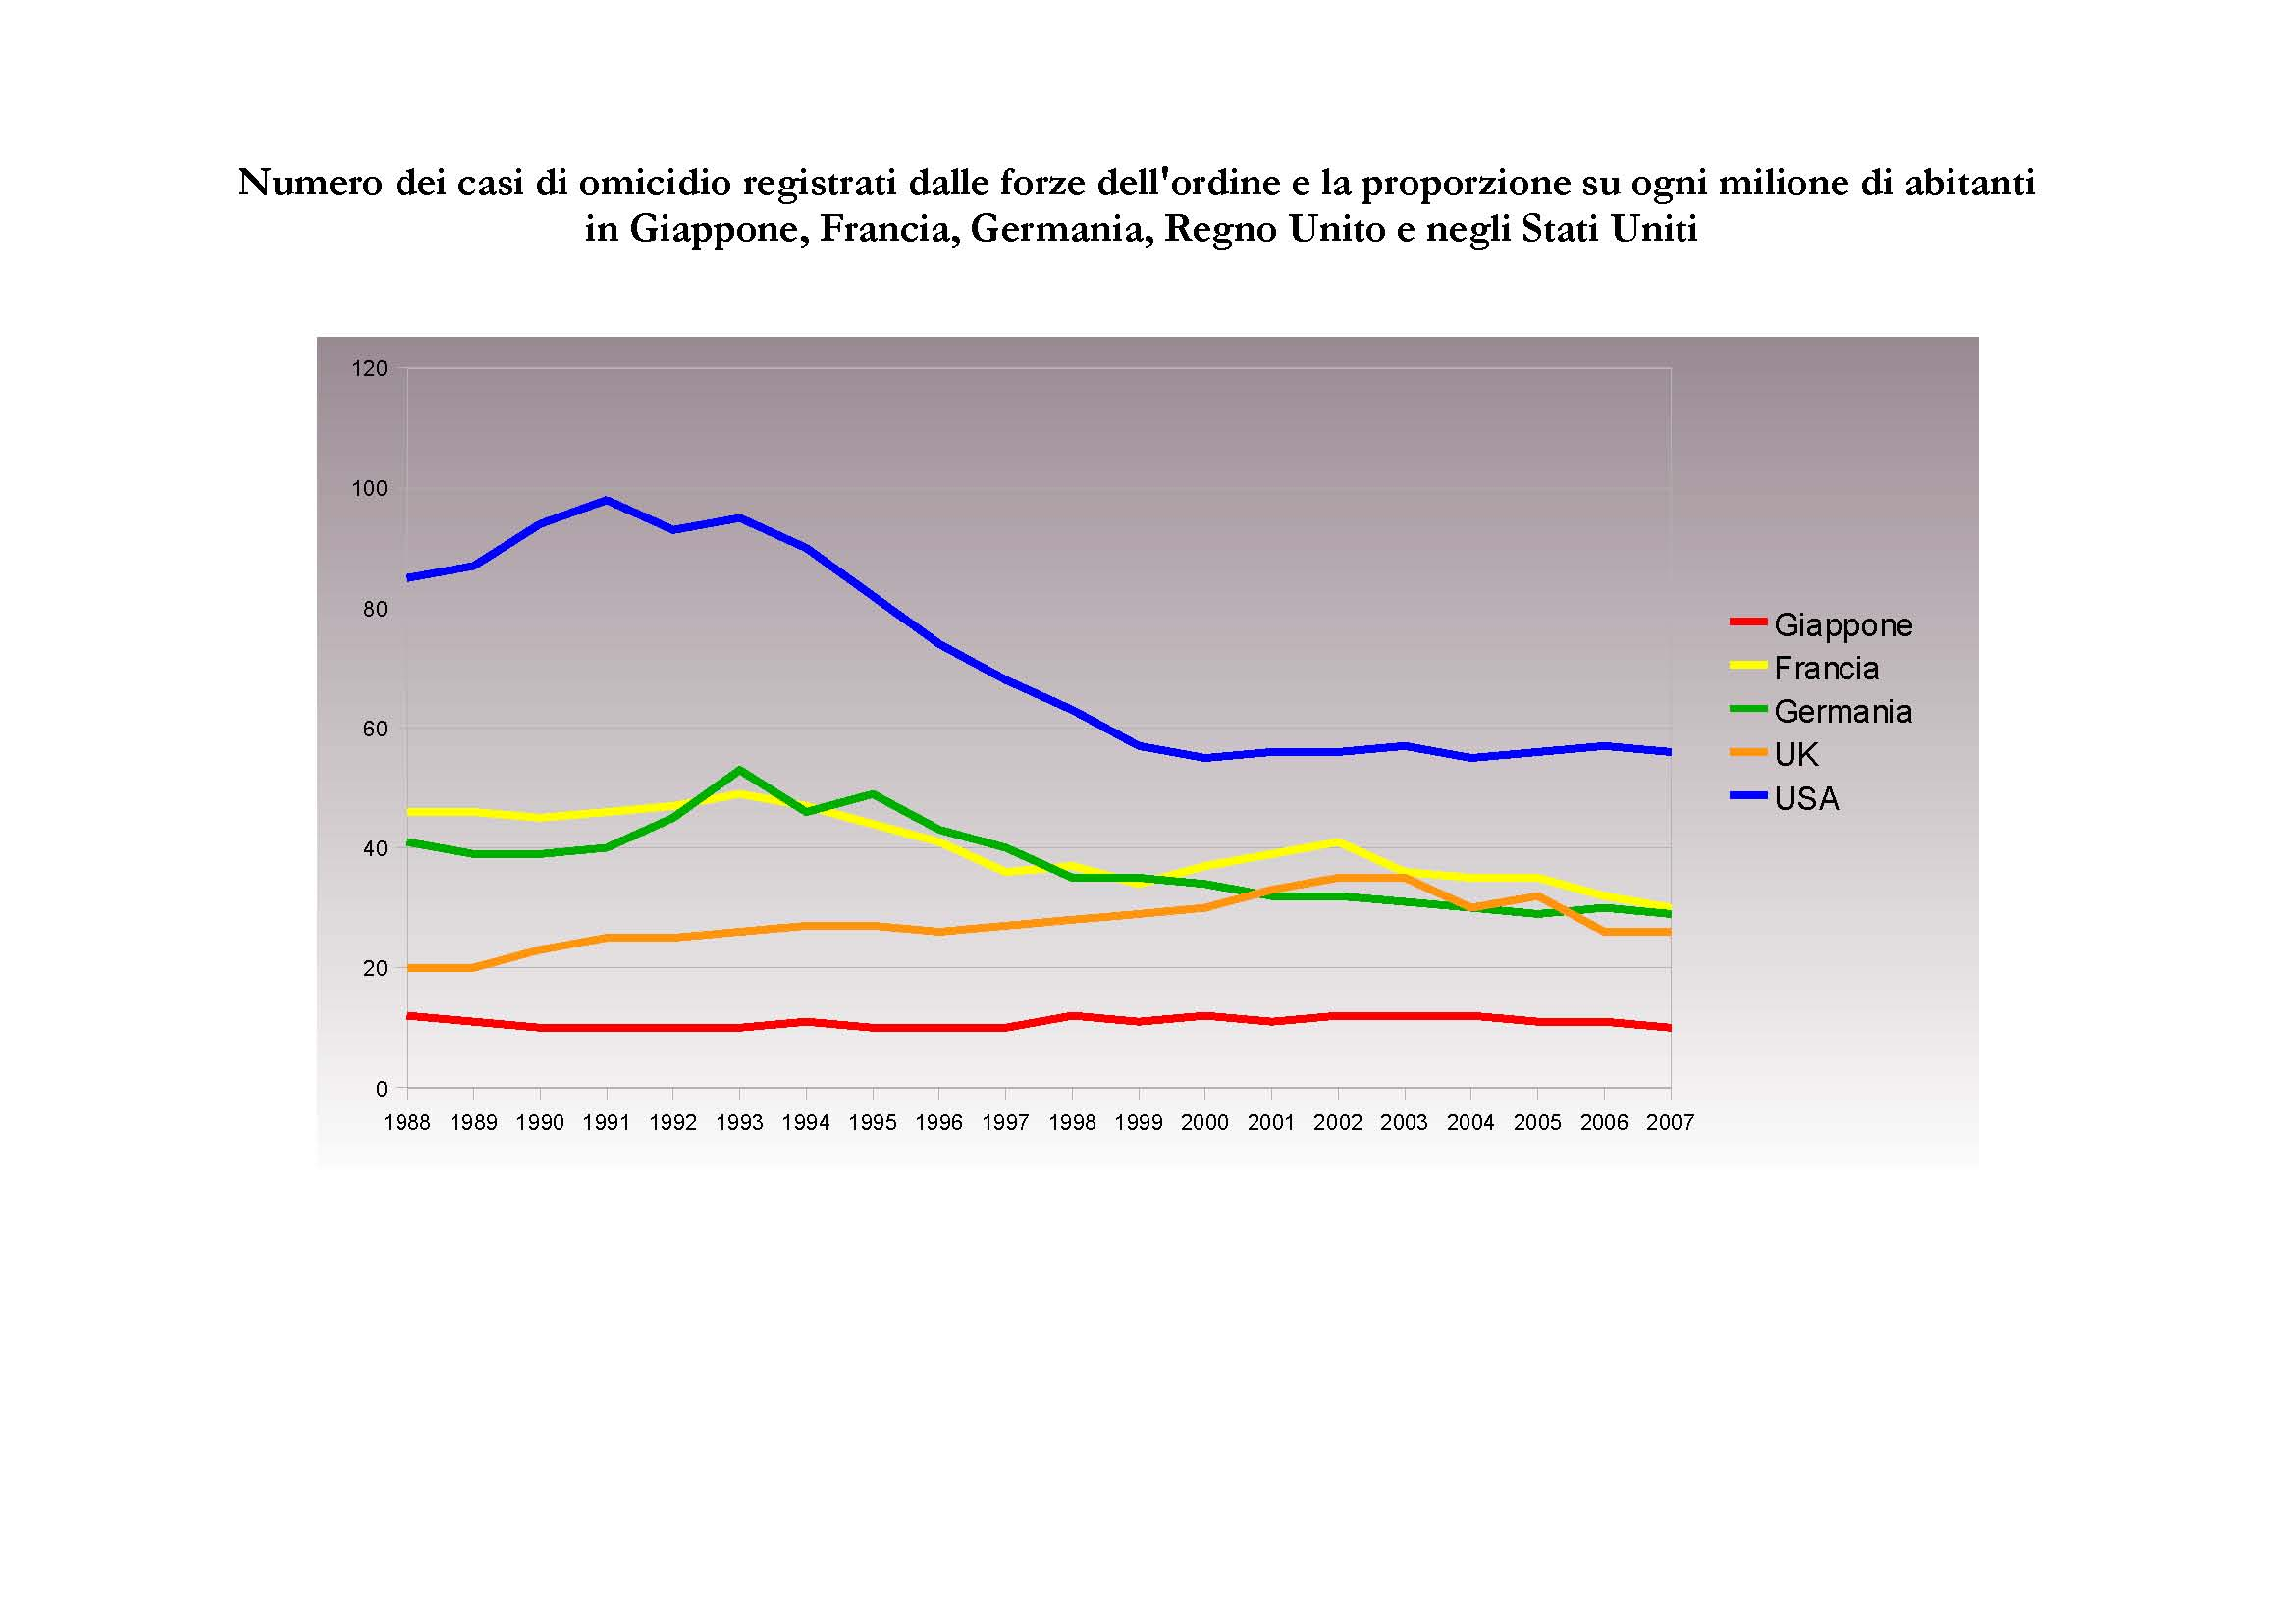 criminalita' in confronto tra 5 paesi (Giappone, Germania, Francia, UK e USA)